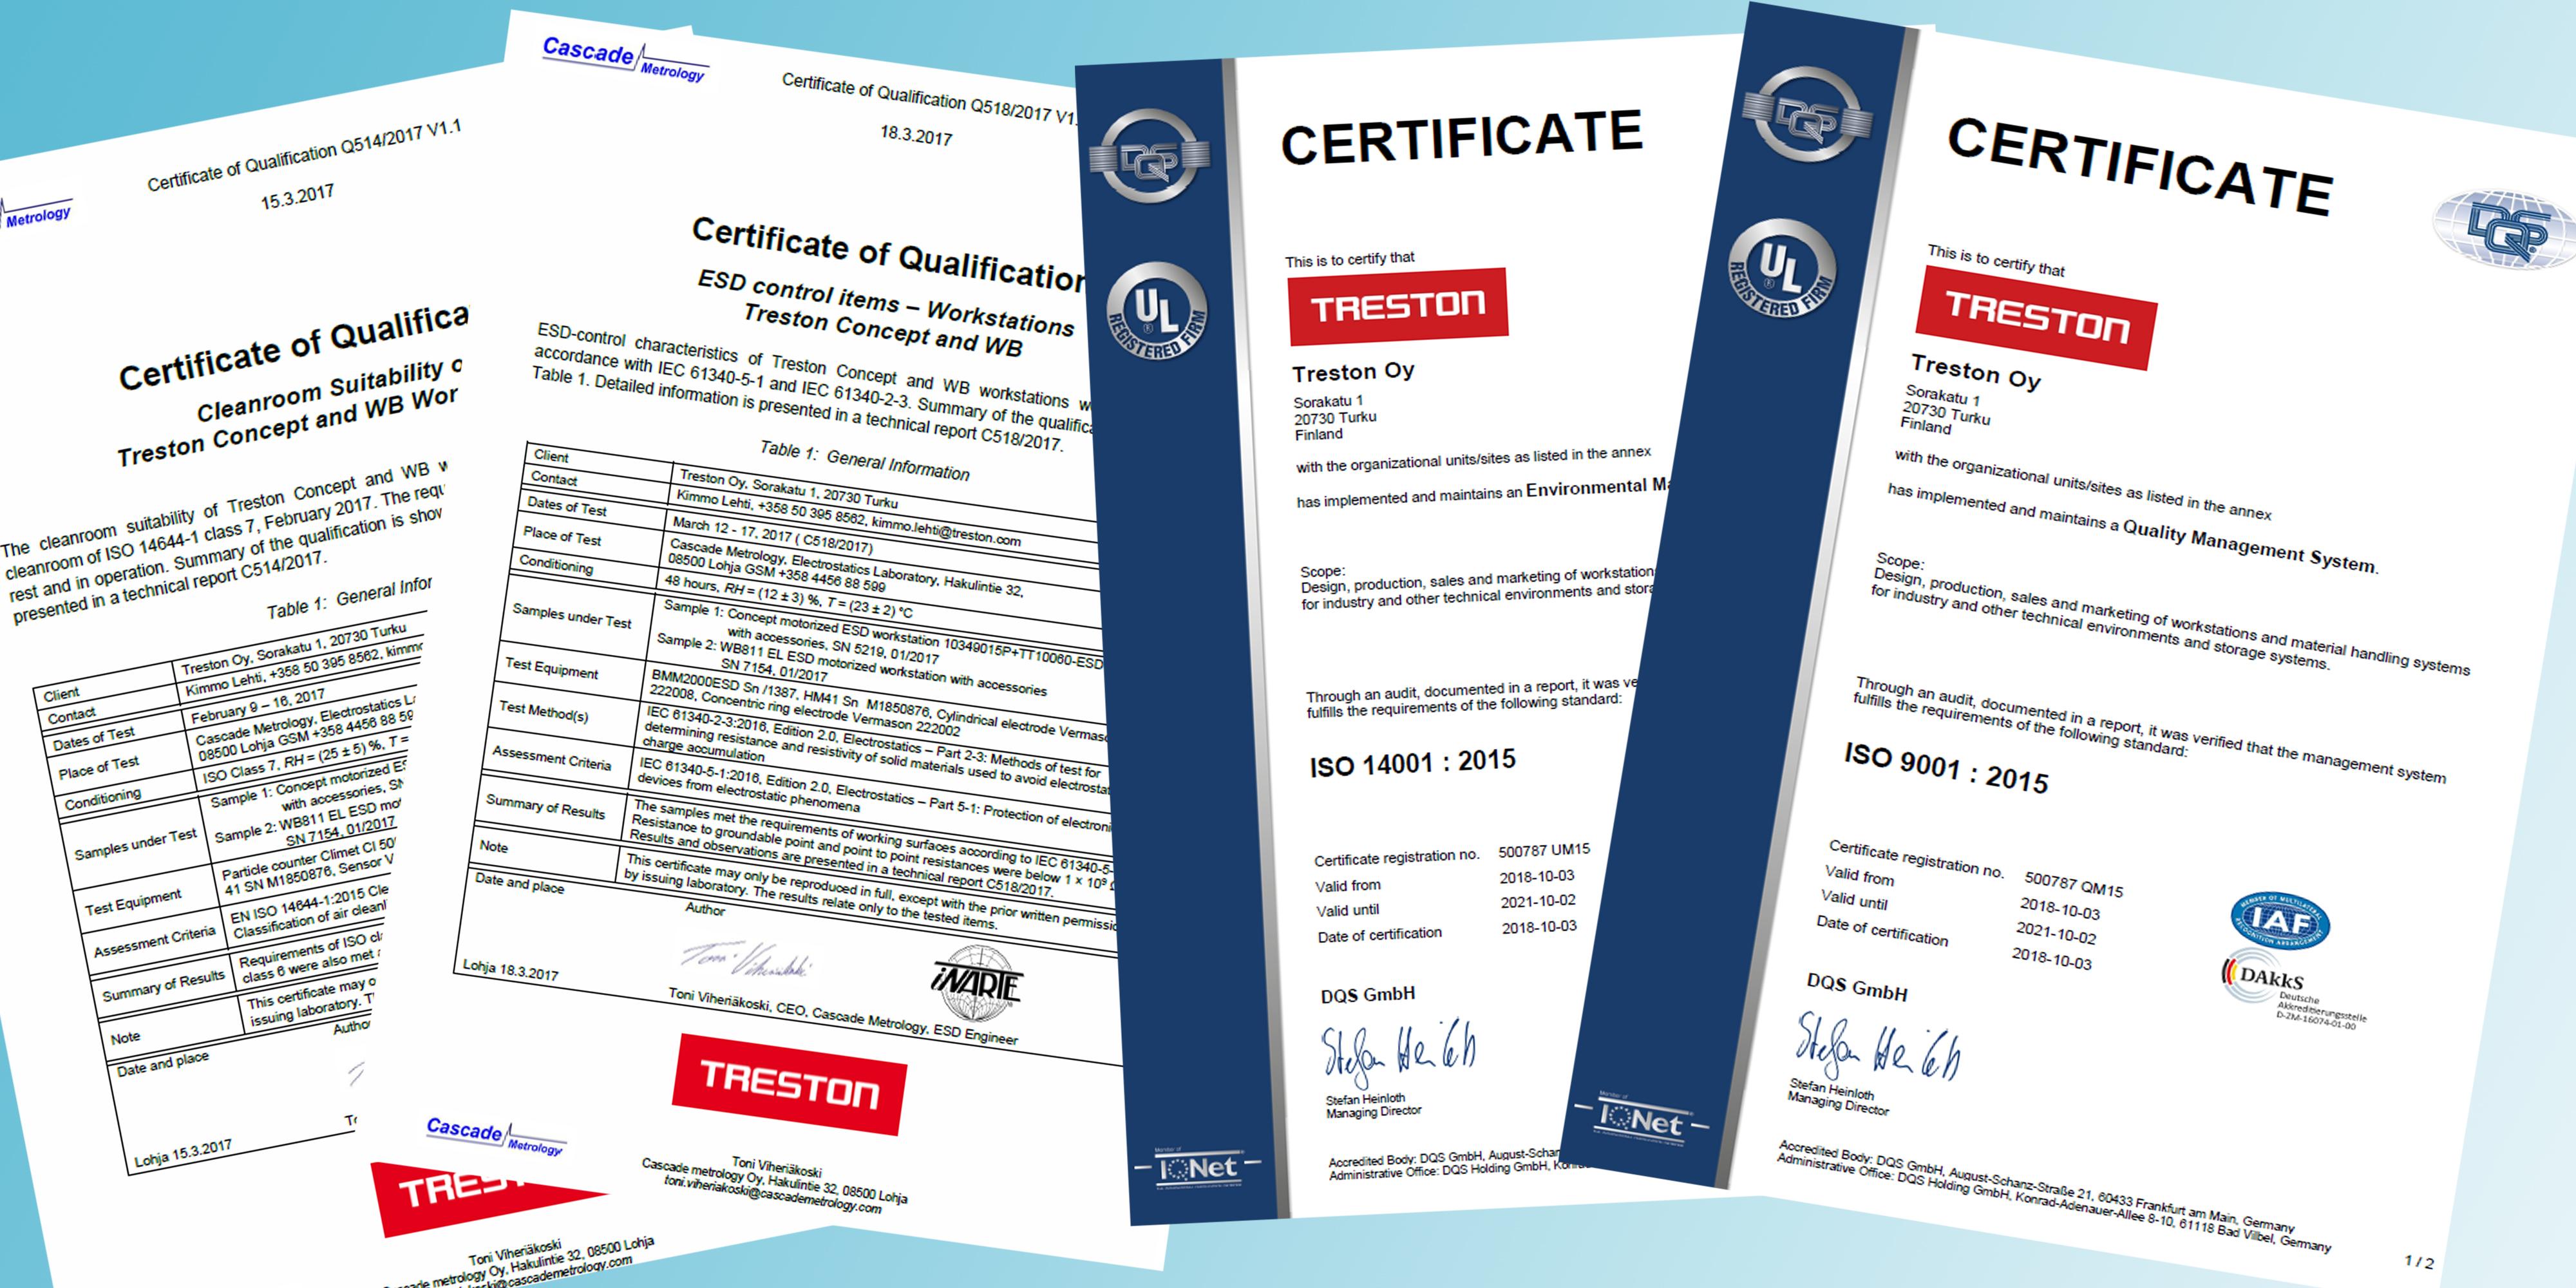 Sovella Nederland Treston certificaat ESD-veilig, Cleanroom, Kwaliteit en duurzaamheid